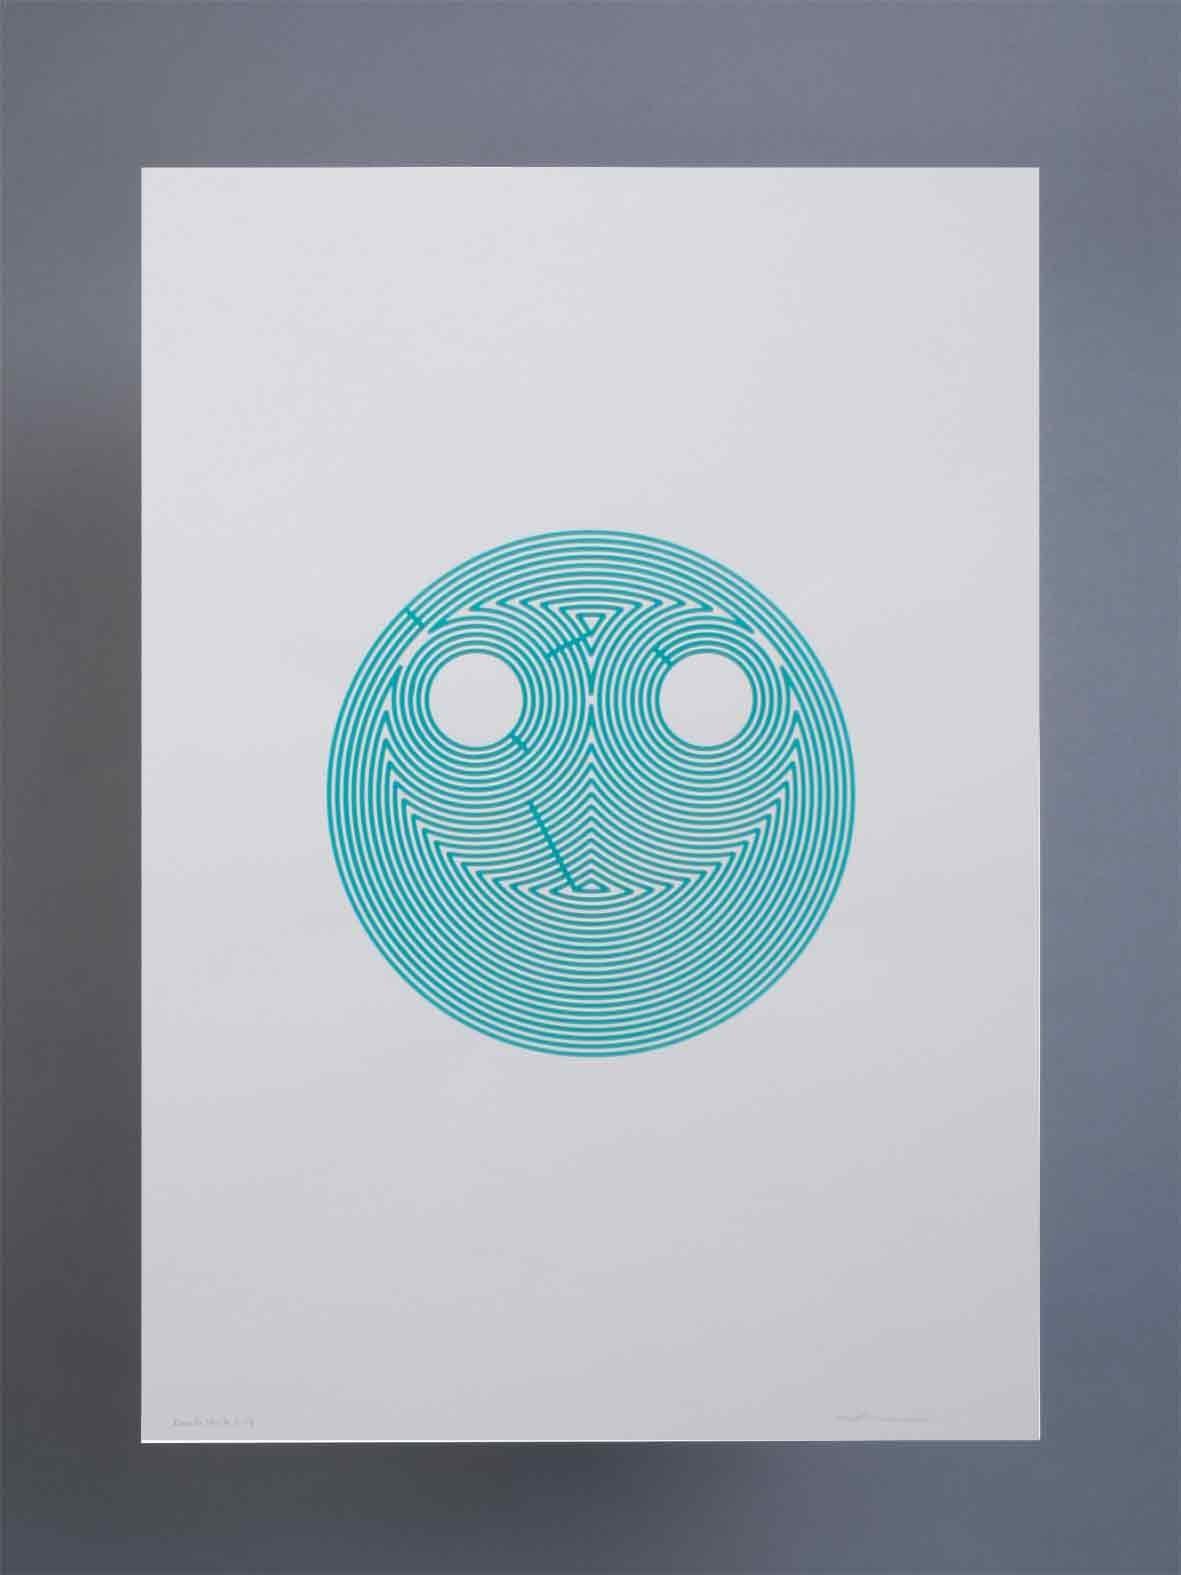 Doodle Mask #15